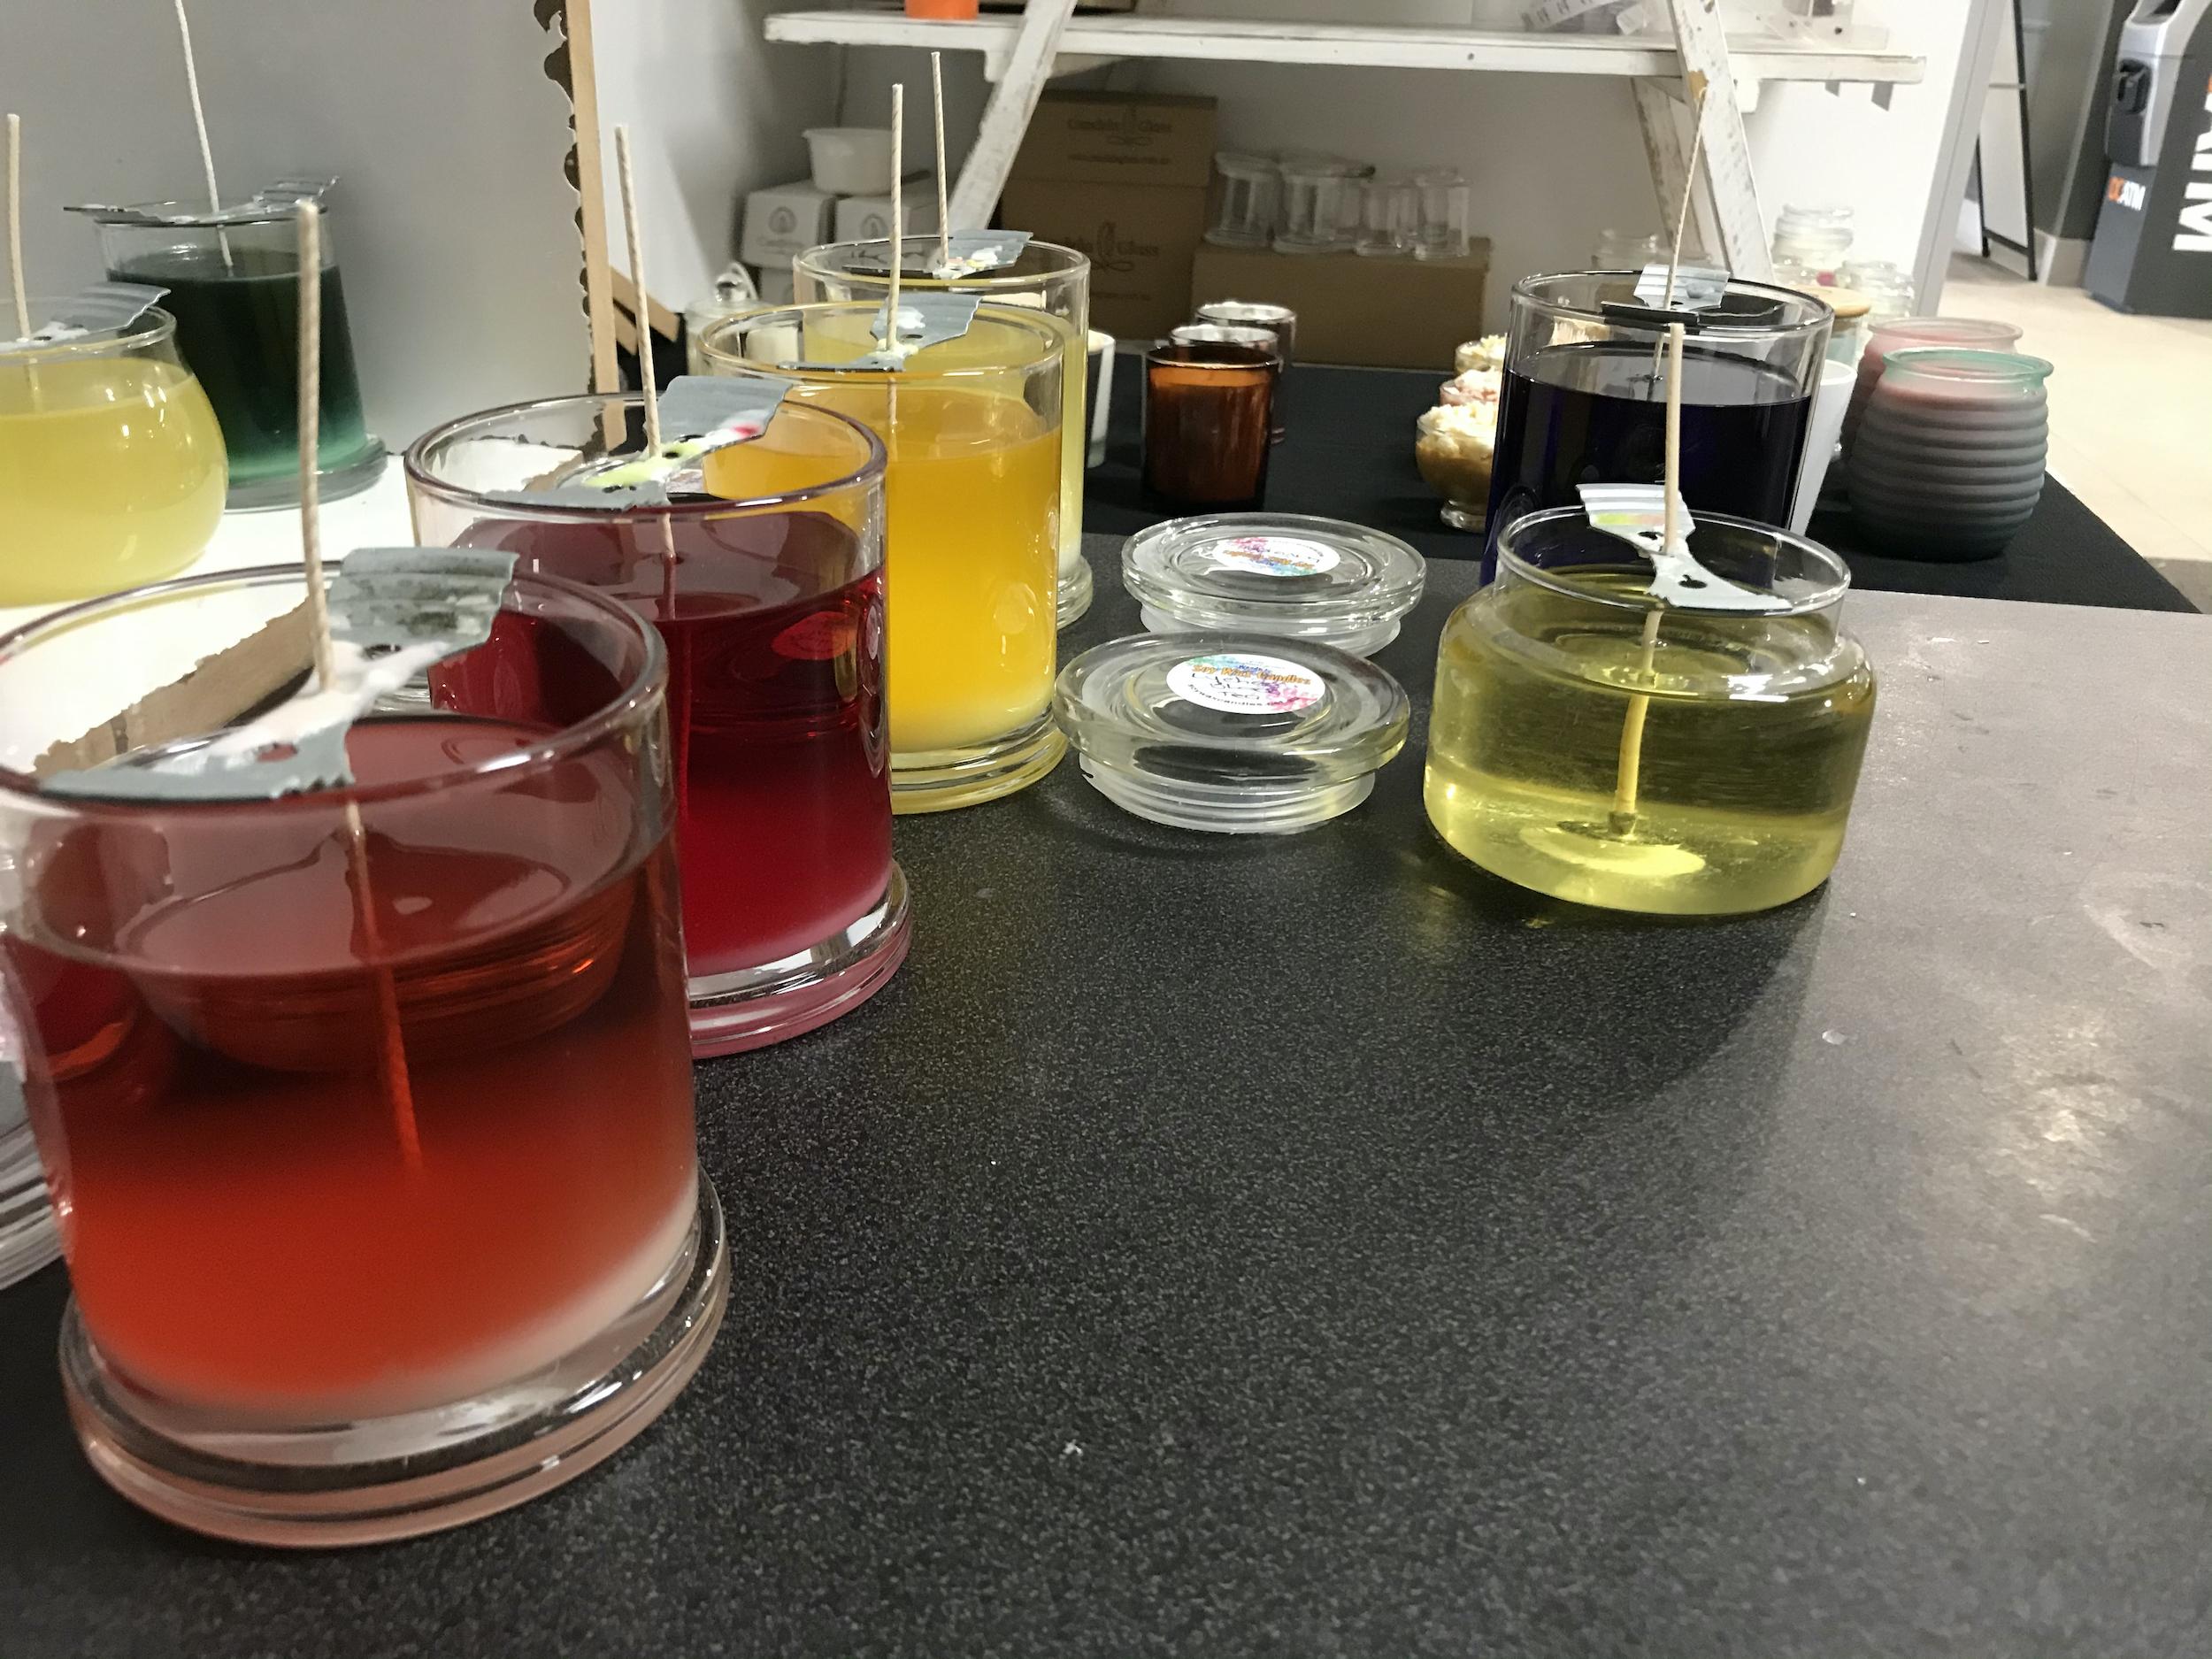 Refilling glass jars